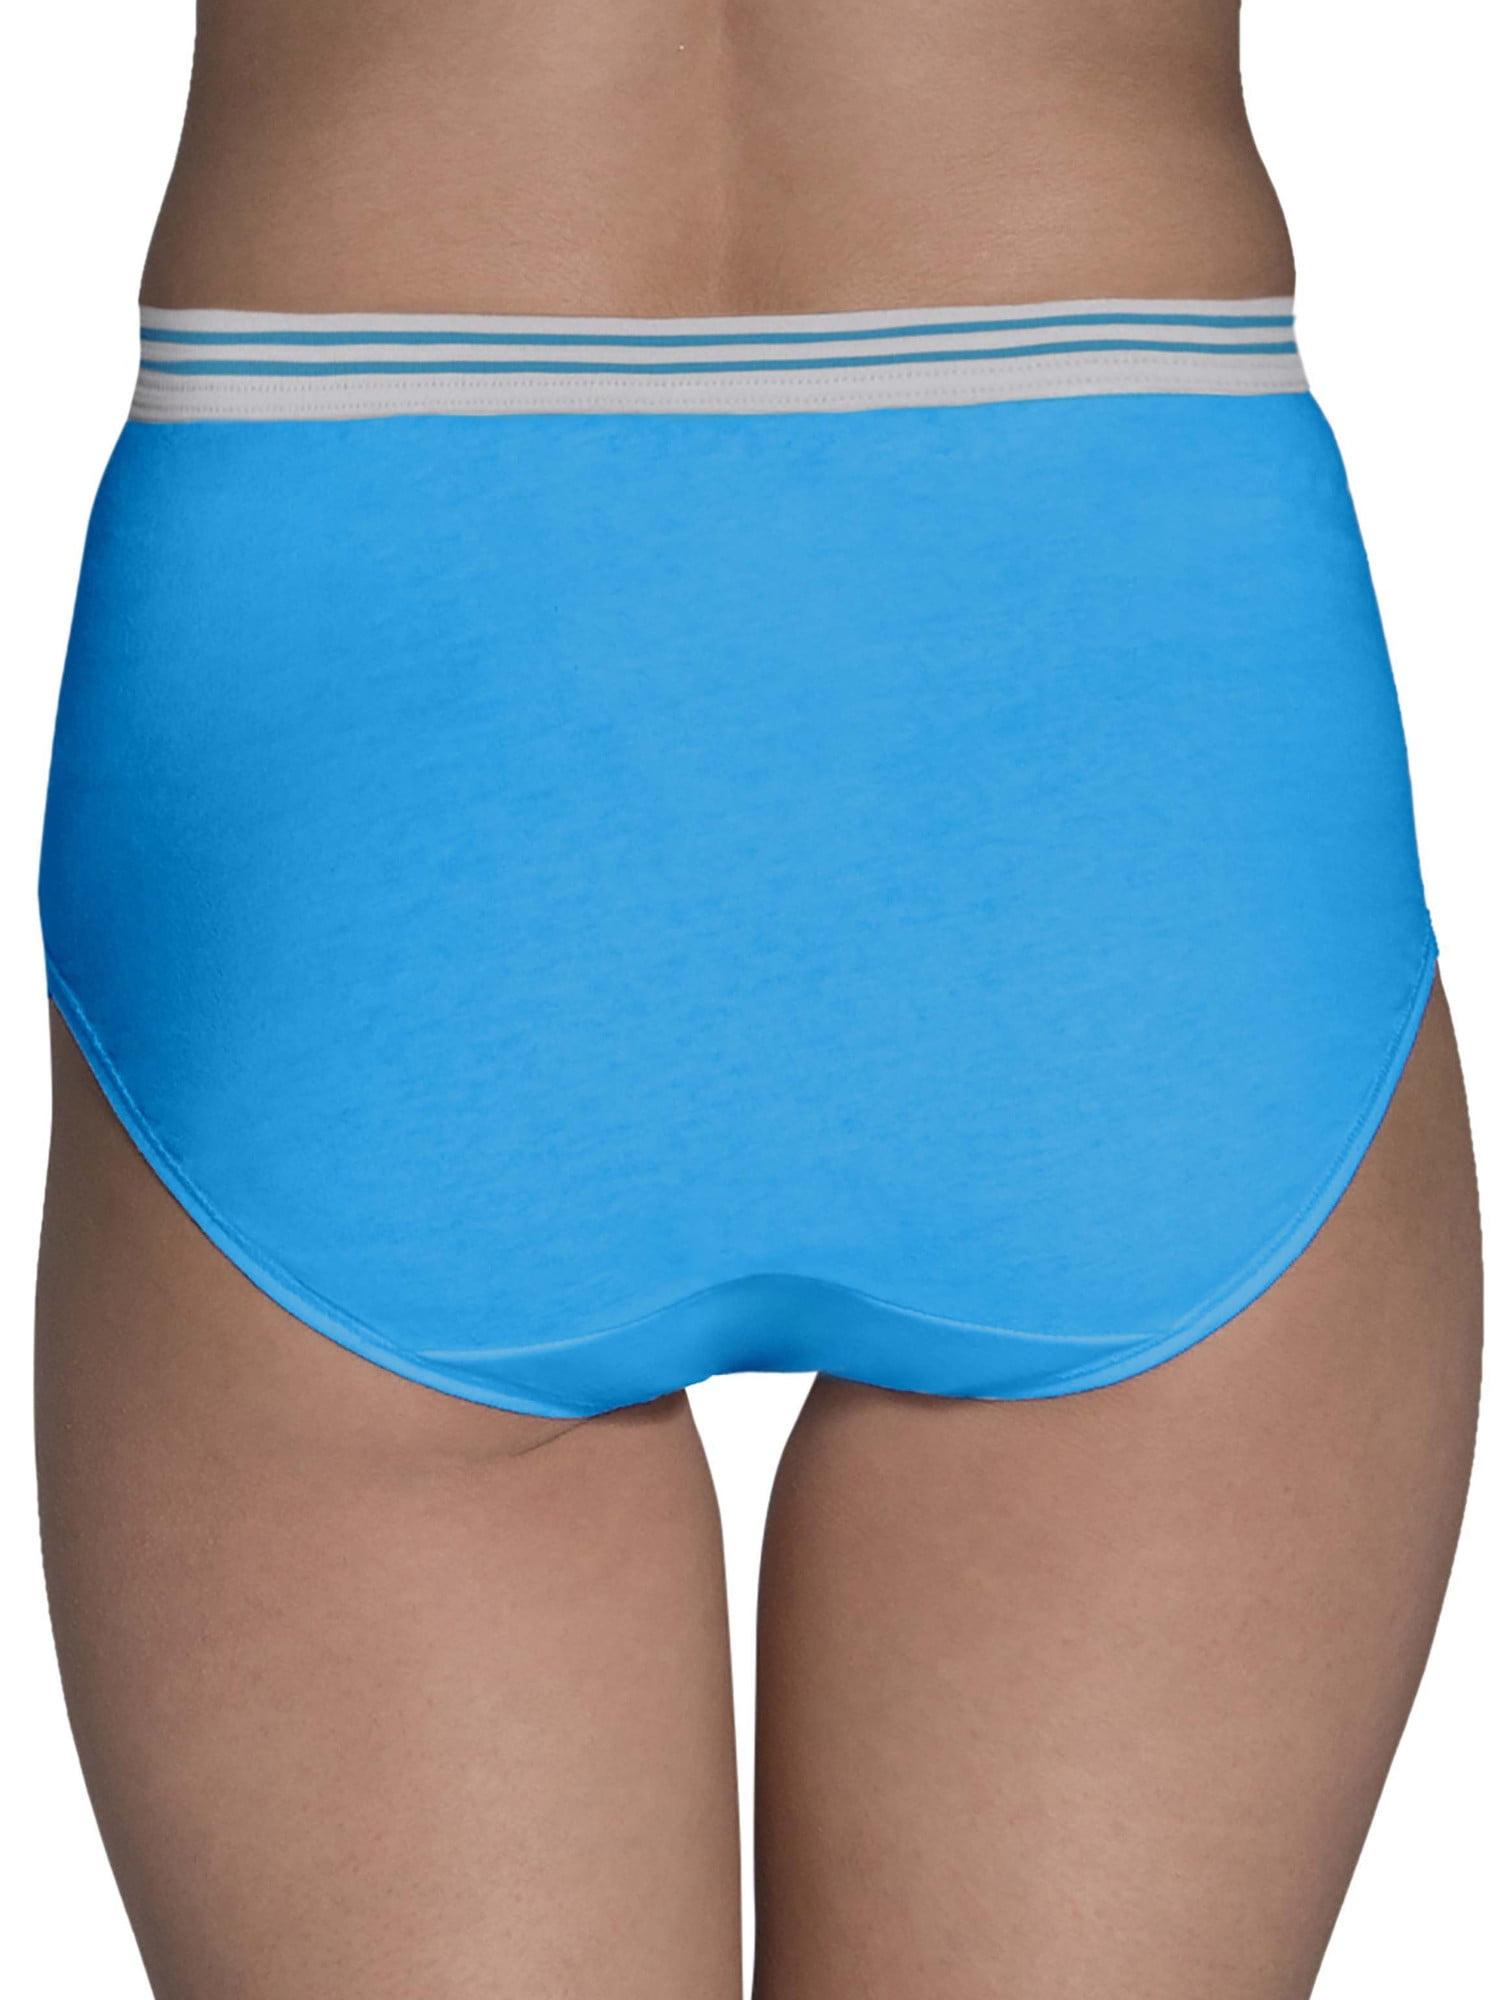 Ready to post now. Christmas Define Good underwear  panties full bum coverage Size medium